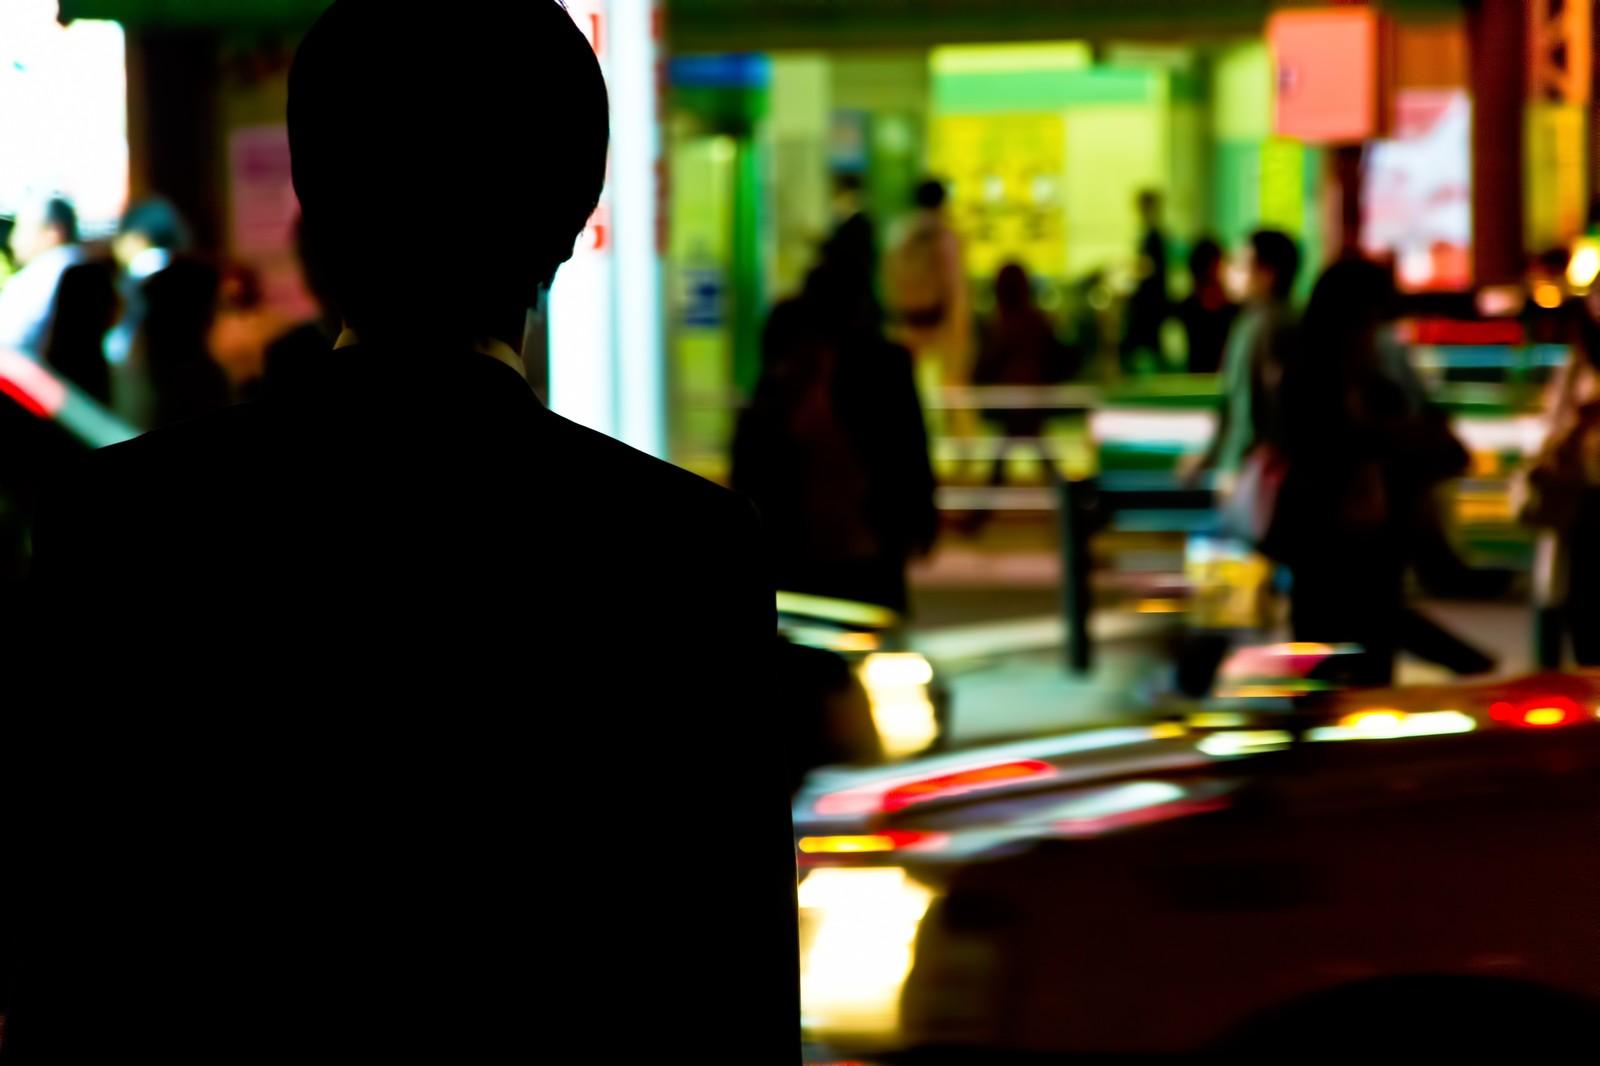 person-standing-streetside